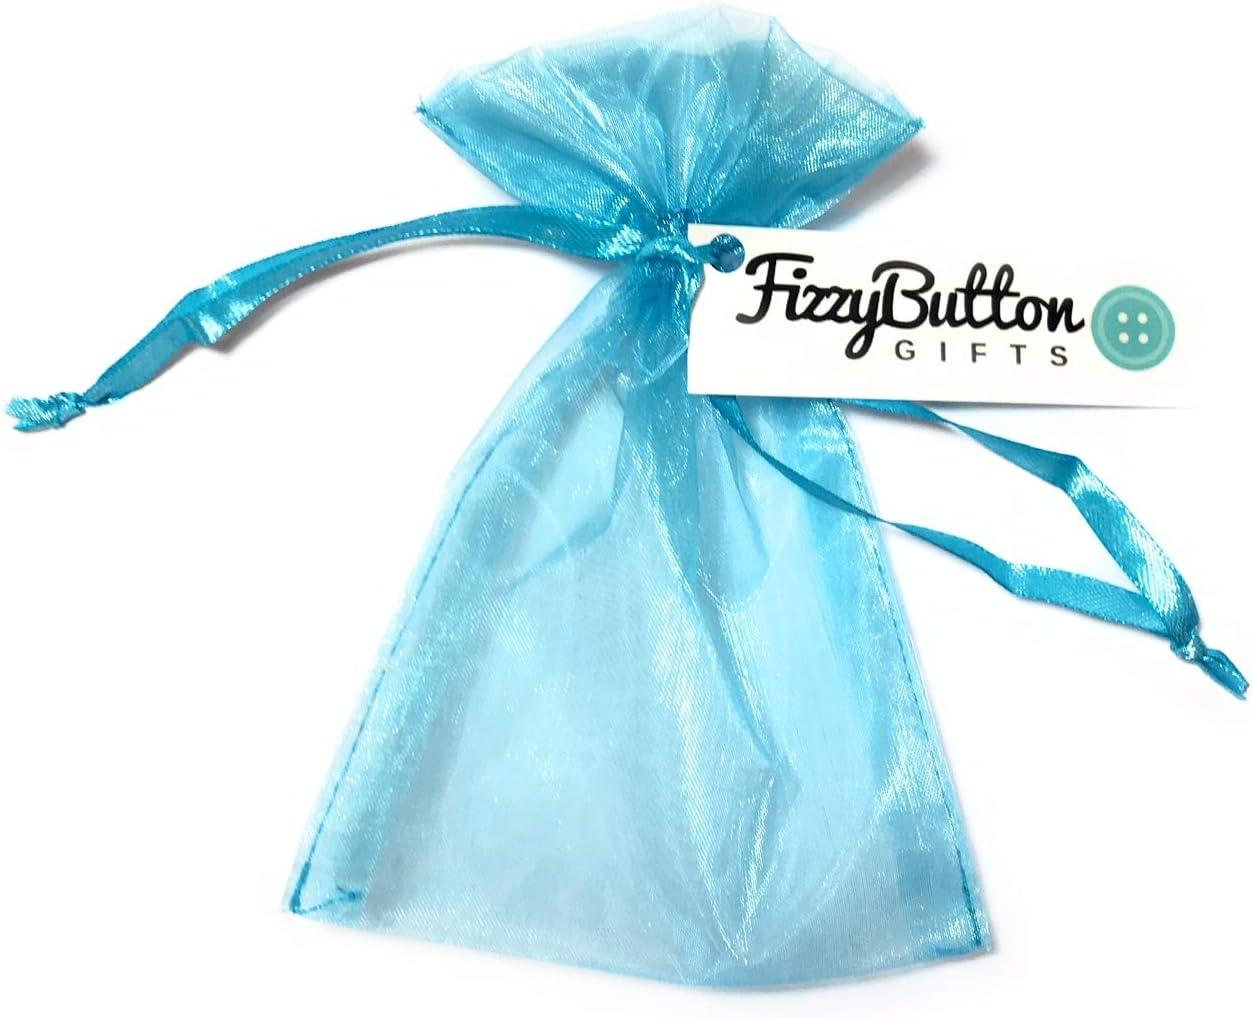 FizzyButton Gifts Silver Tone Koala Charm Mini Bookmark in Gift Bag